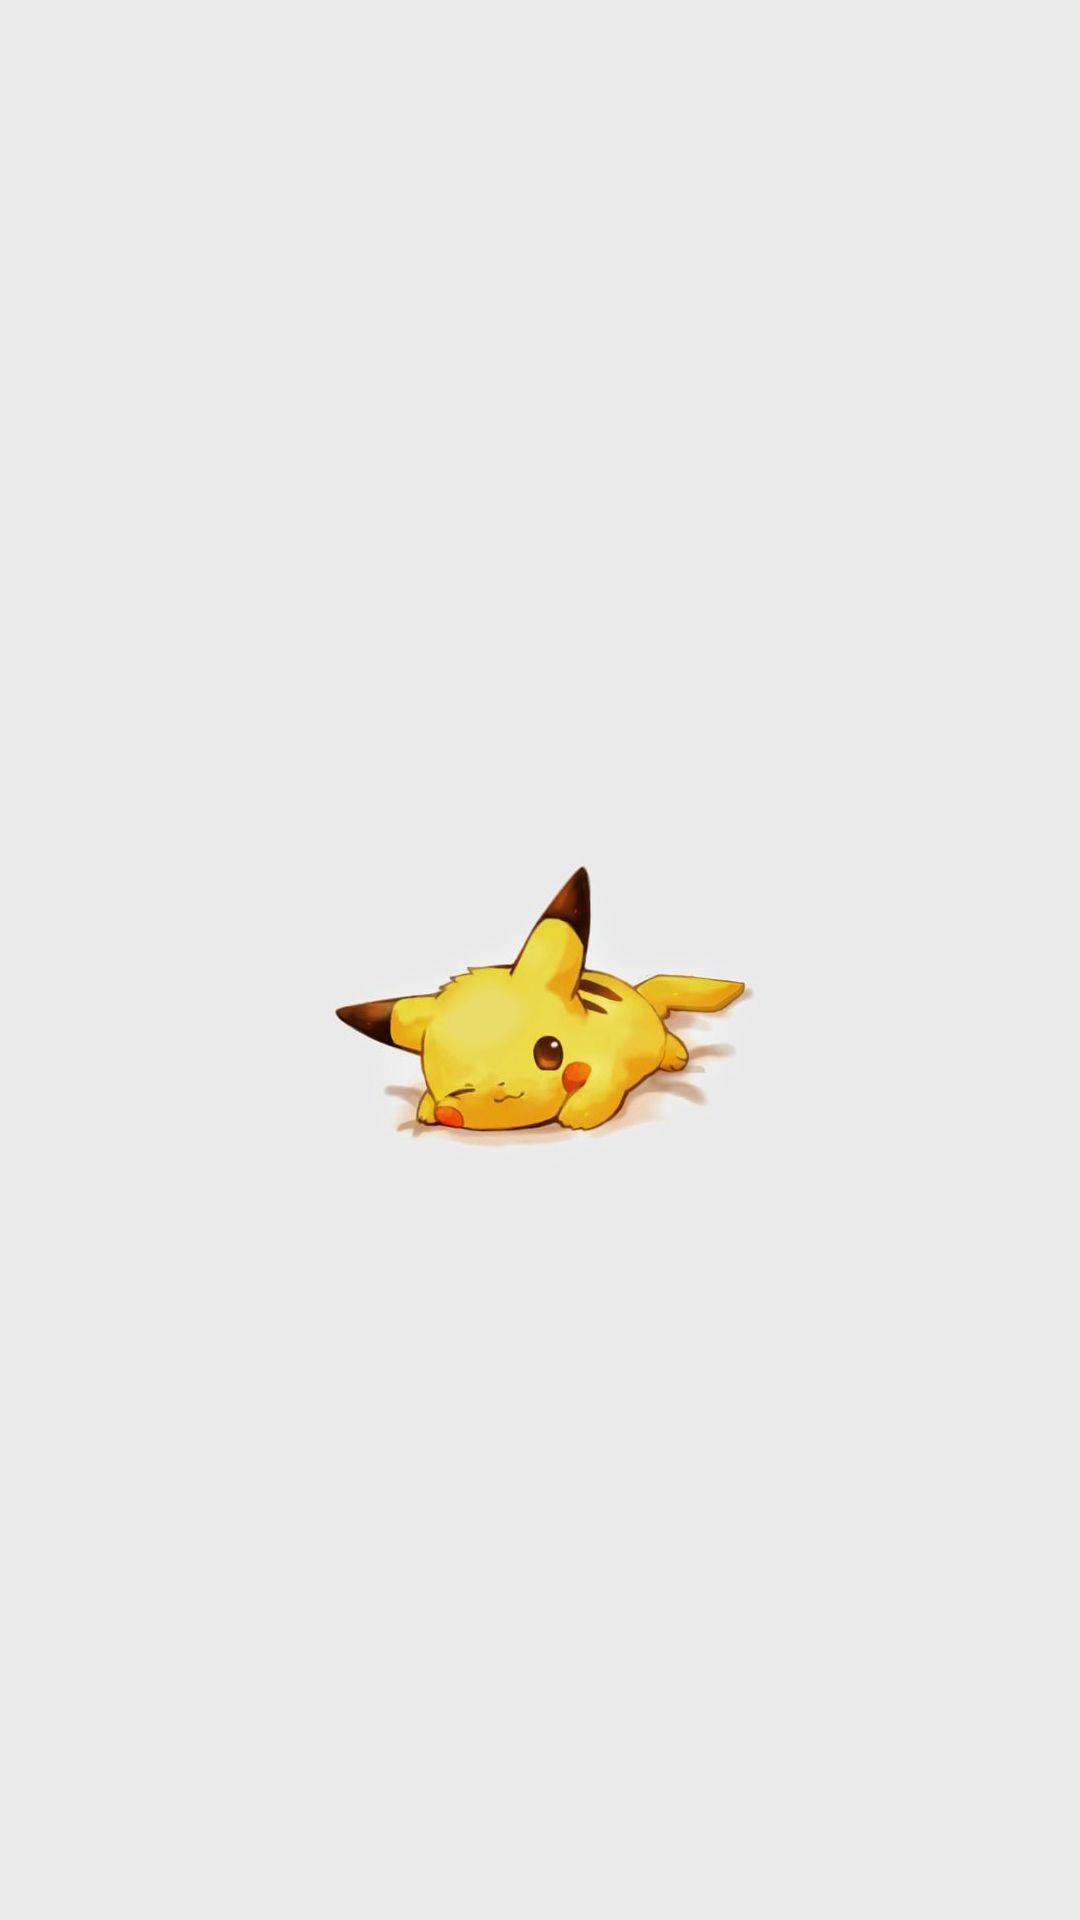 cute pikachu pokemon character iphone 6 hd wallpaper httpfreebestpicture